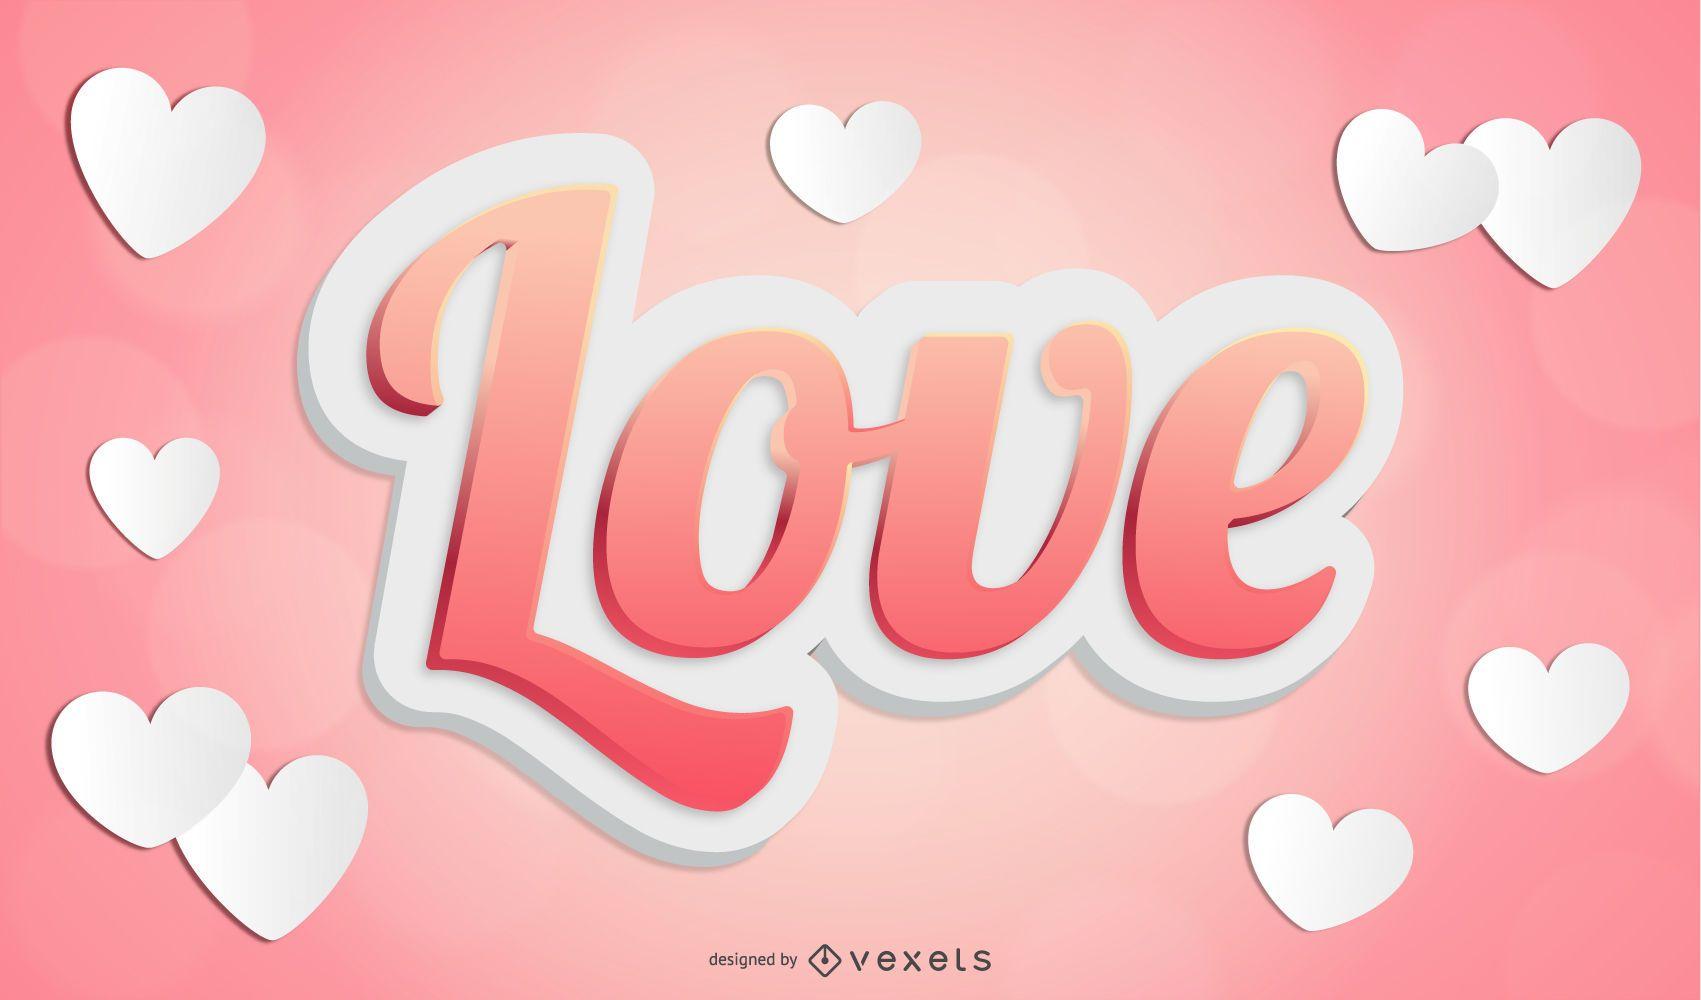 Texto de amor vetor 3d